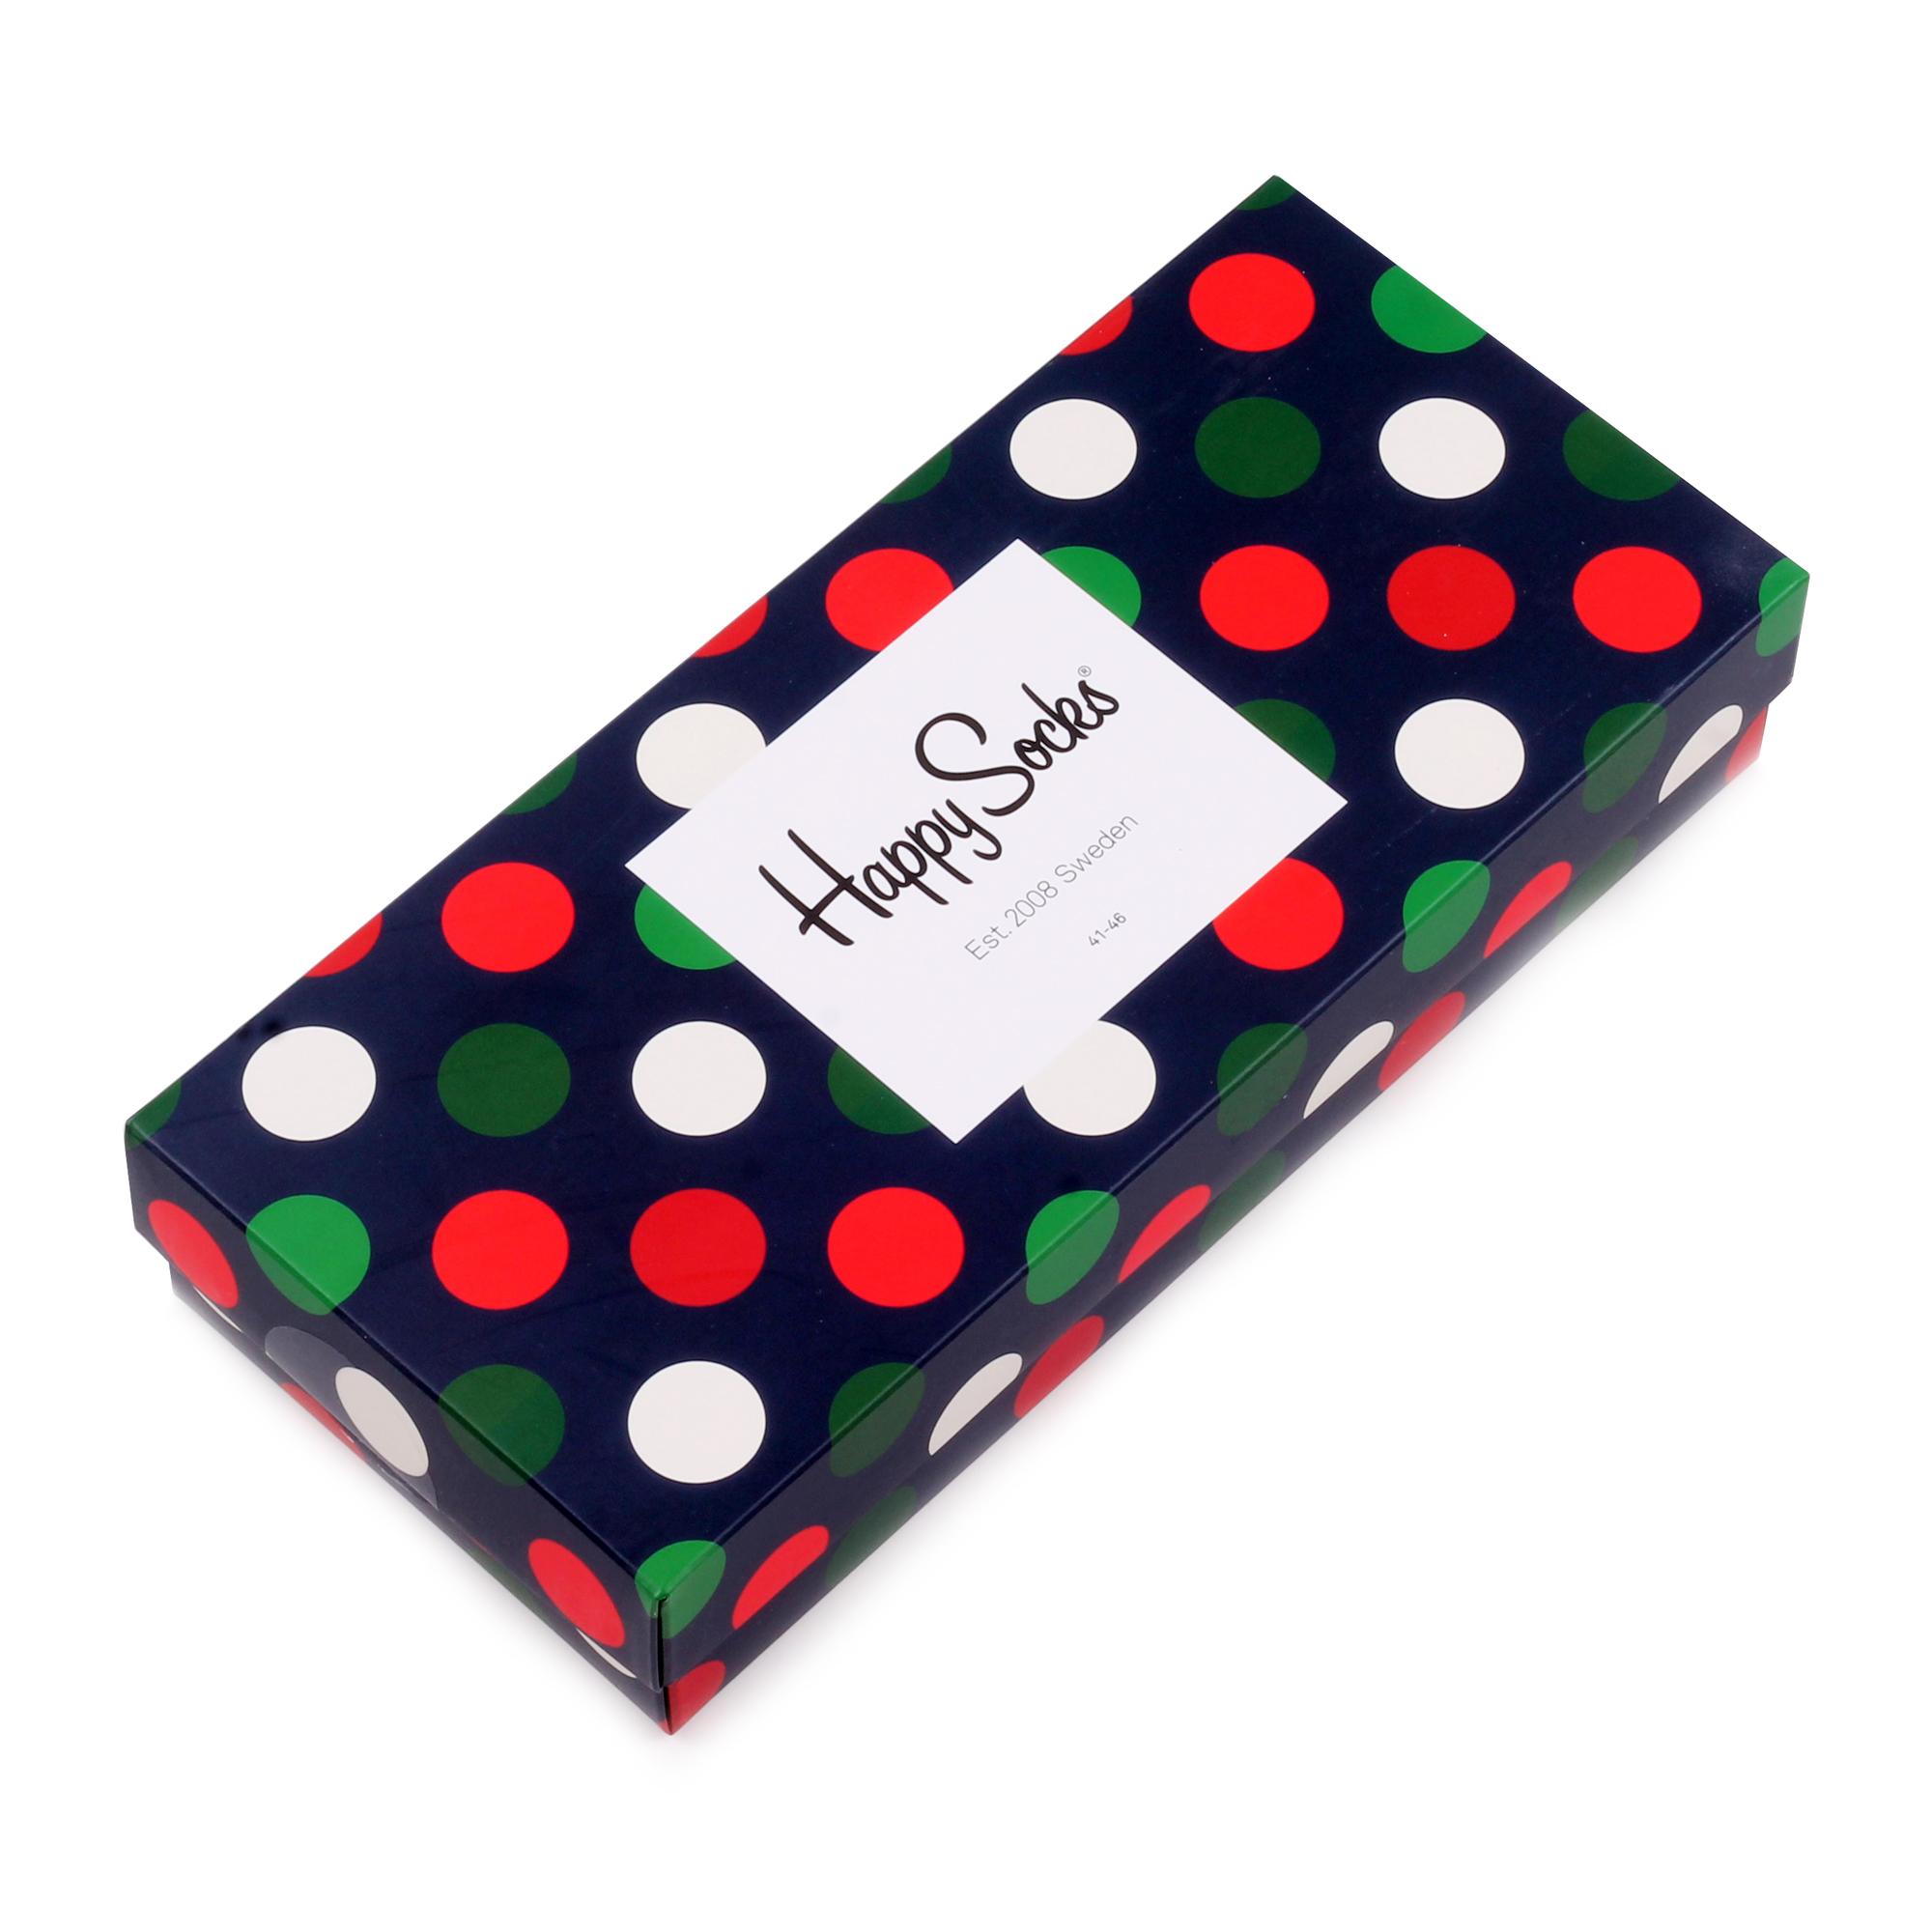 Носки унисекс Happy Socks Happy Socks Набор из 4-х пар носков - Big Dot разноцветные 36-40